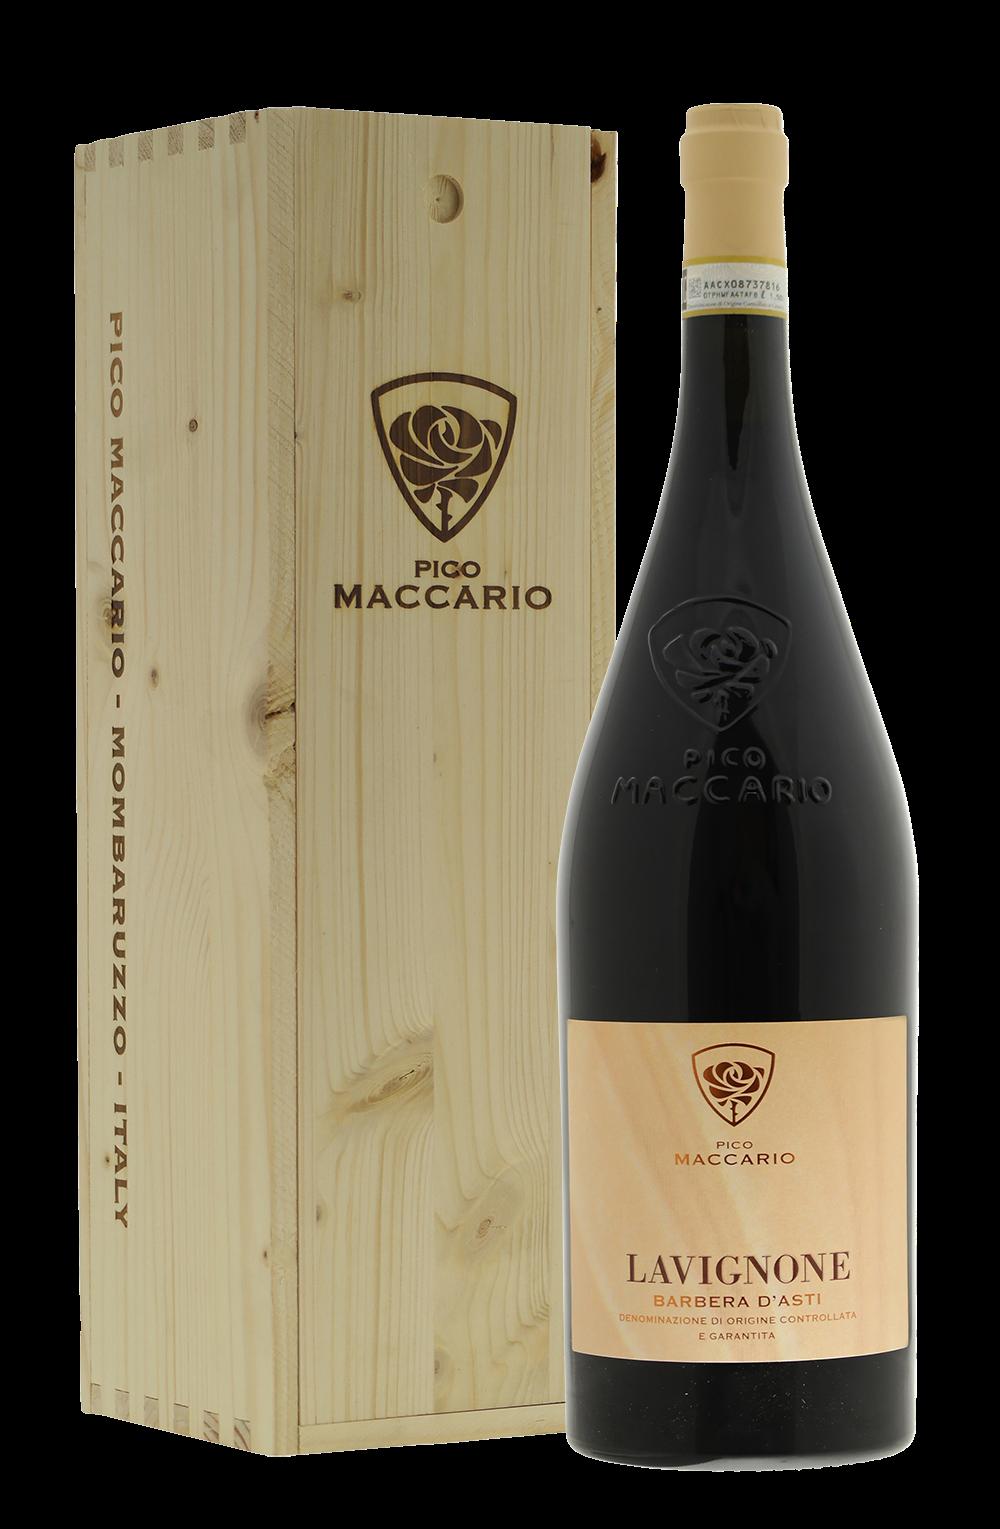 Pico Maccario Lavignone Magnum